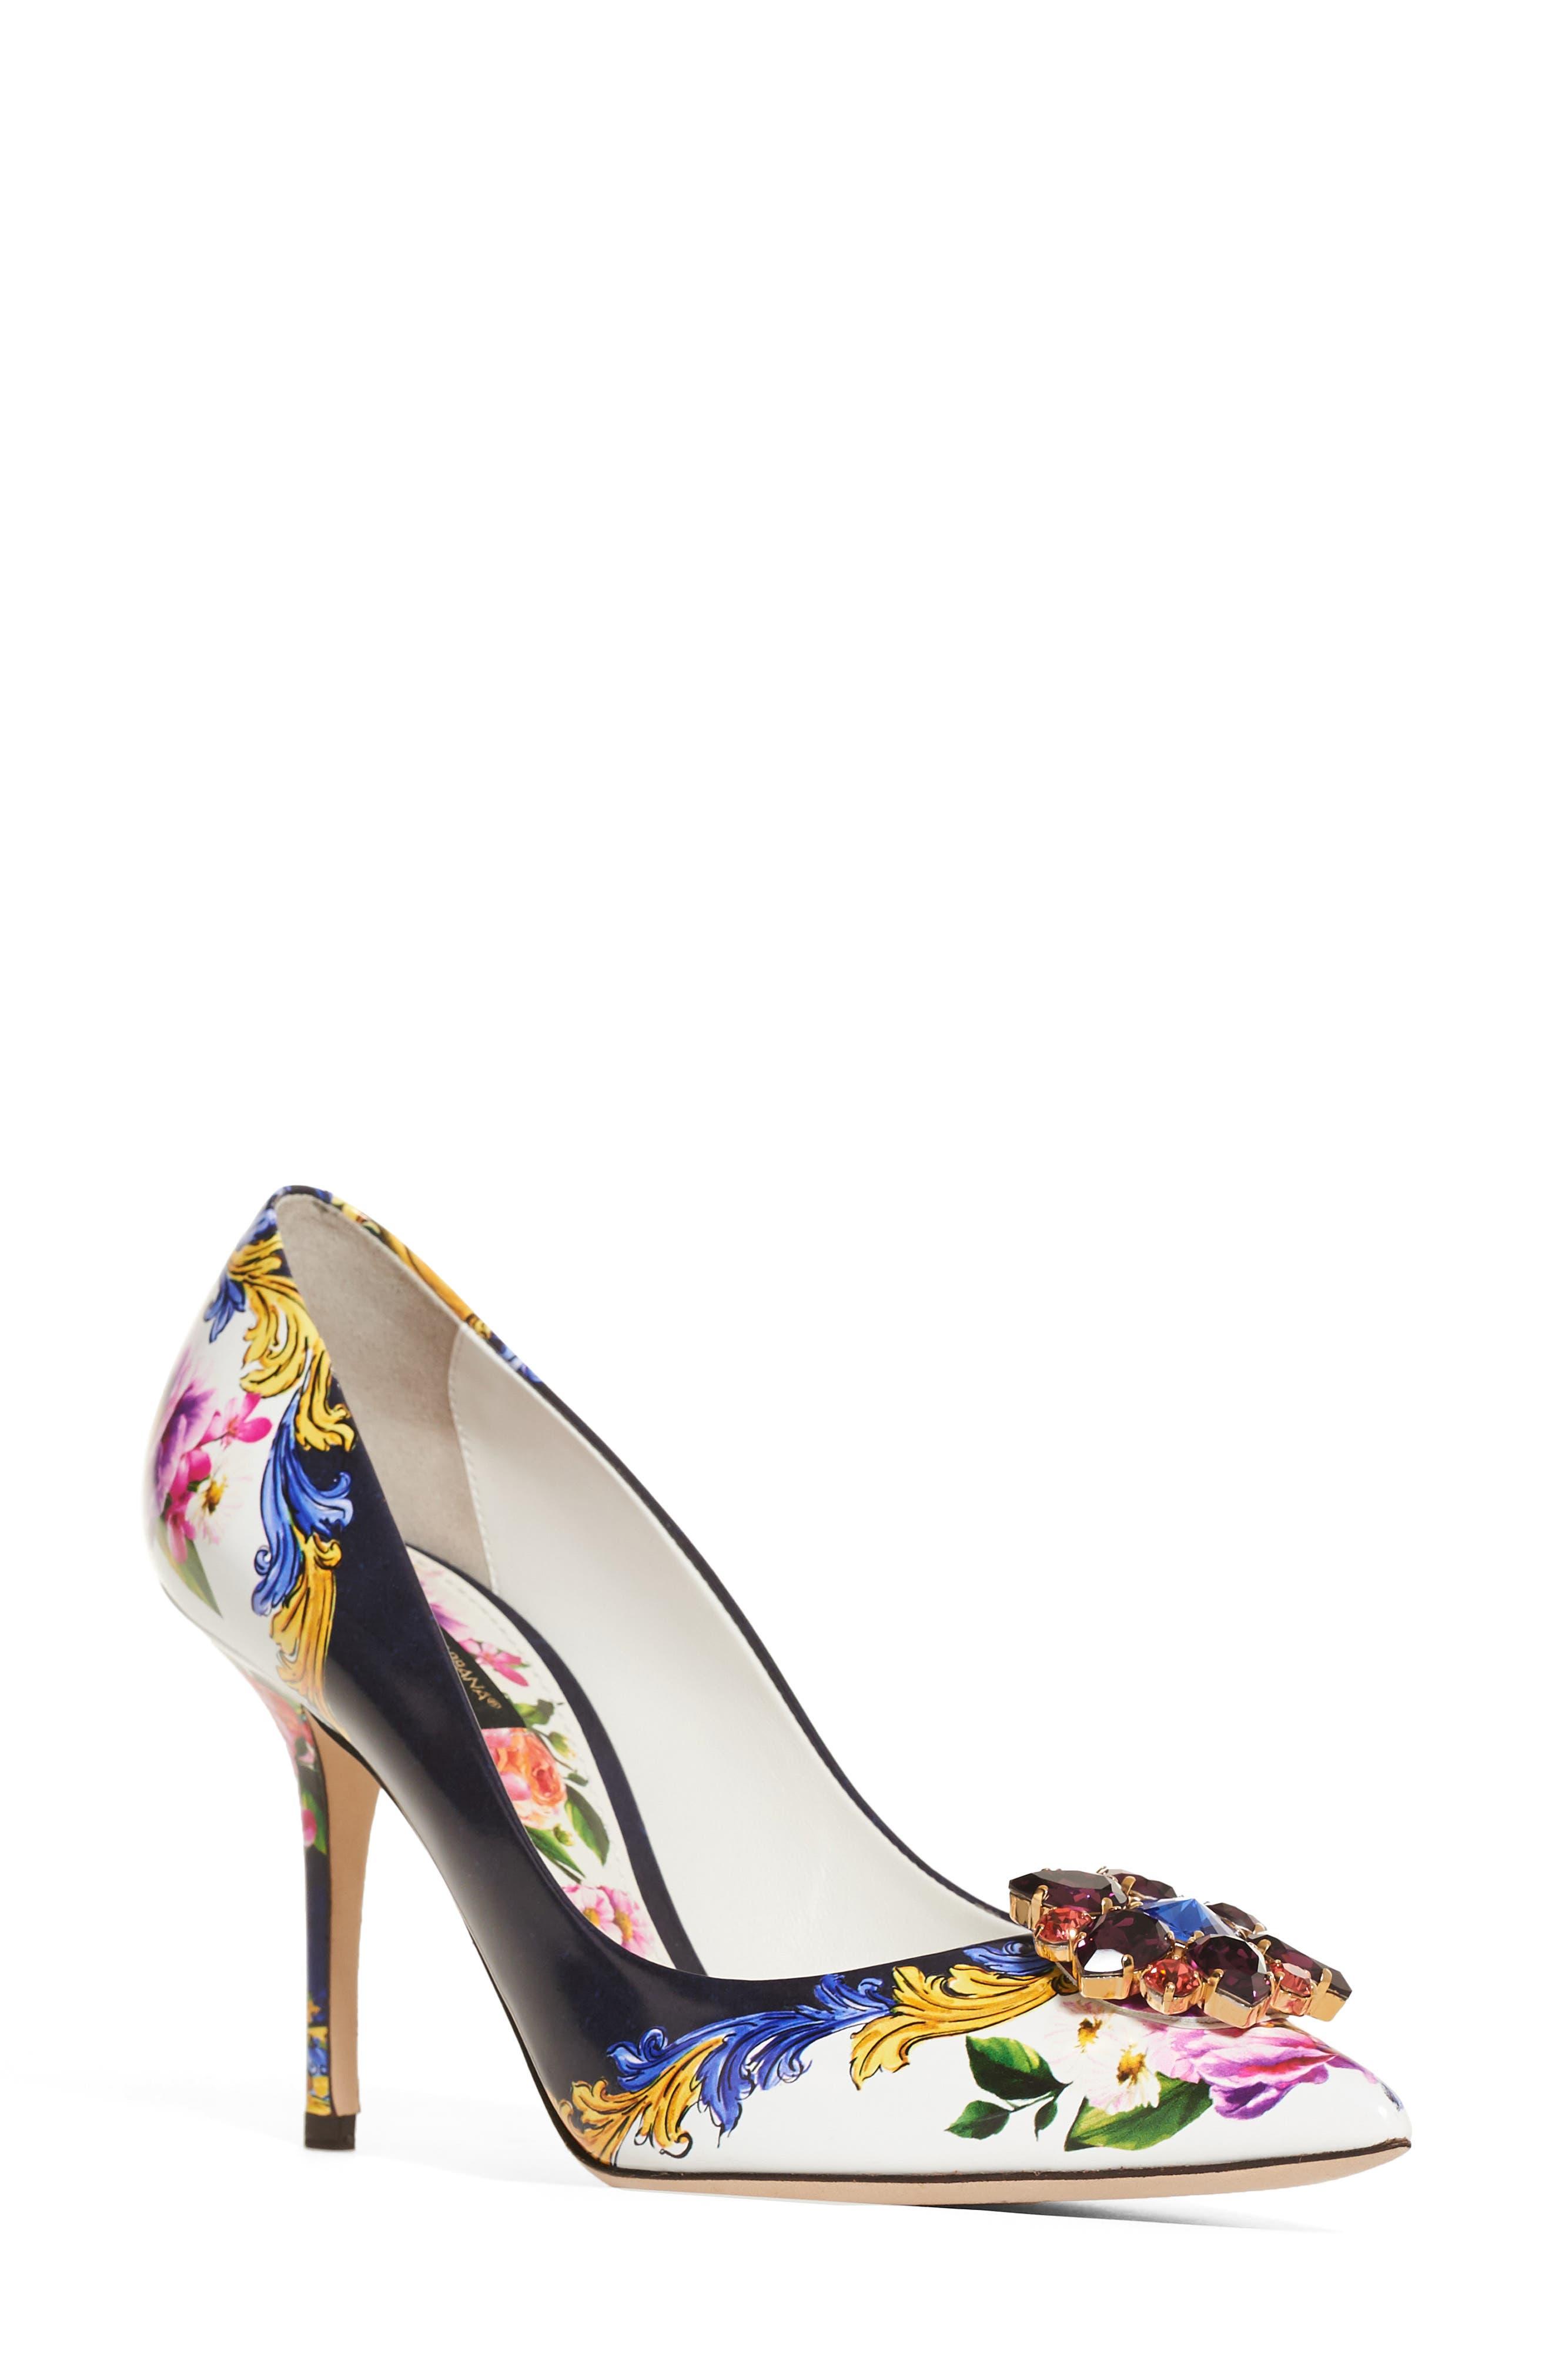 Dolce & Gabbana Print Pump,                             Main thumbnail 1, color,                             Navy/ White Floral